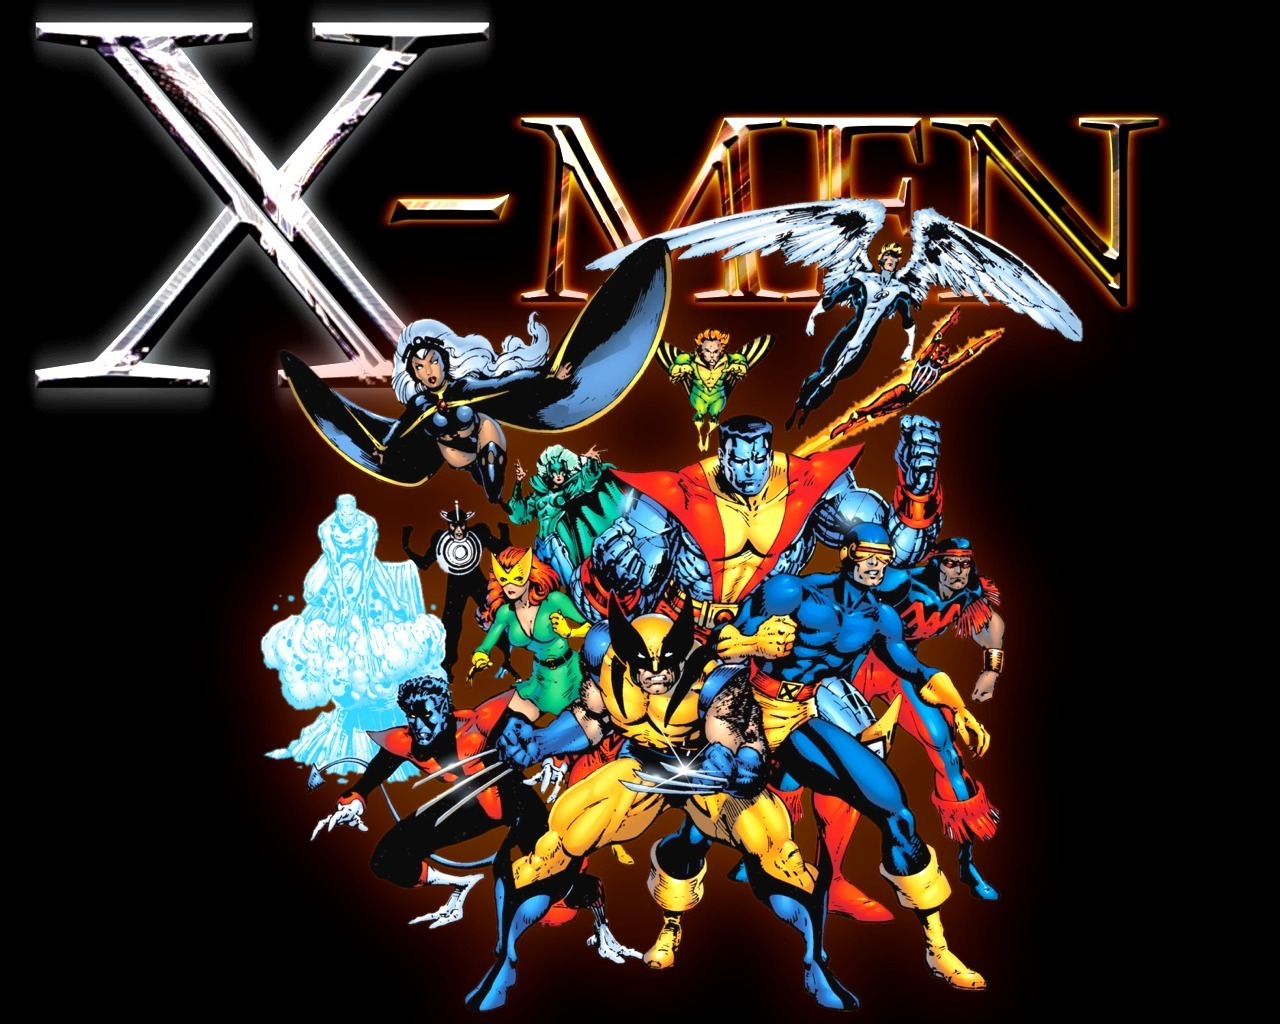 Wallpaper X Men The Movie 1280x1024